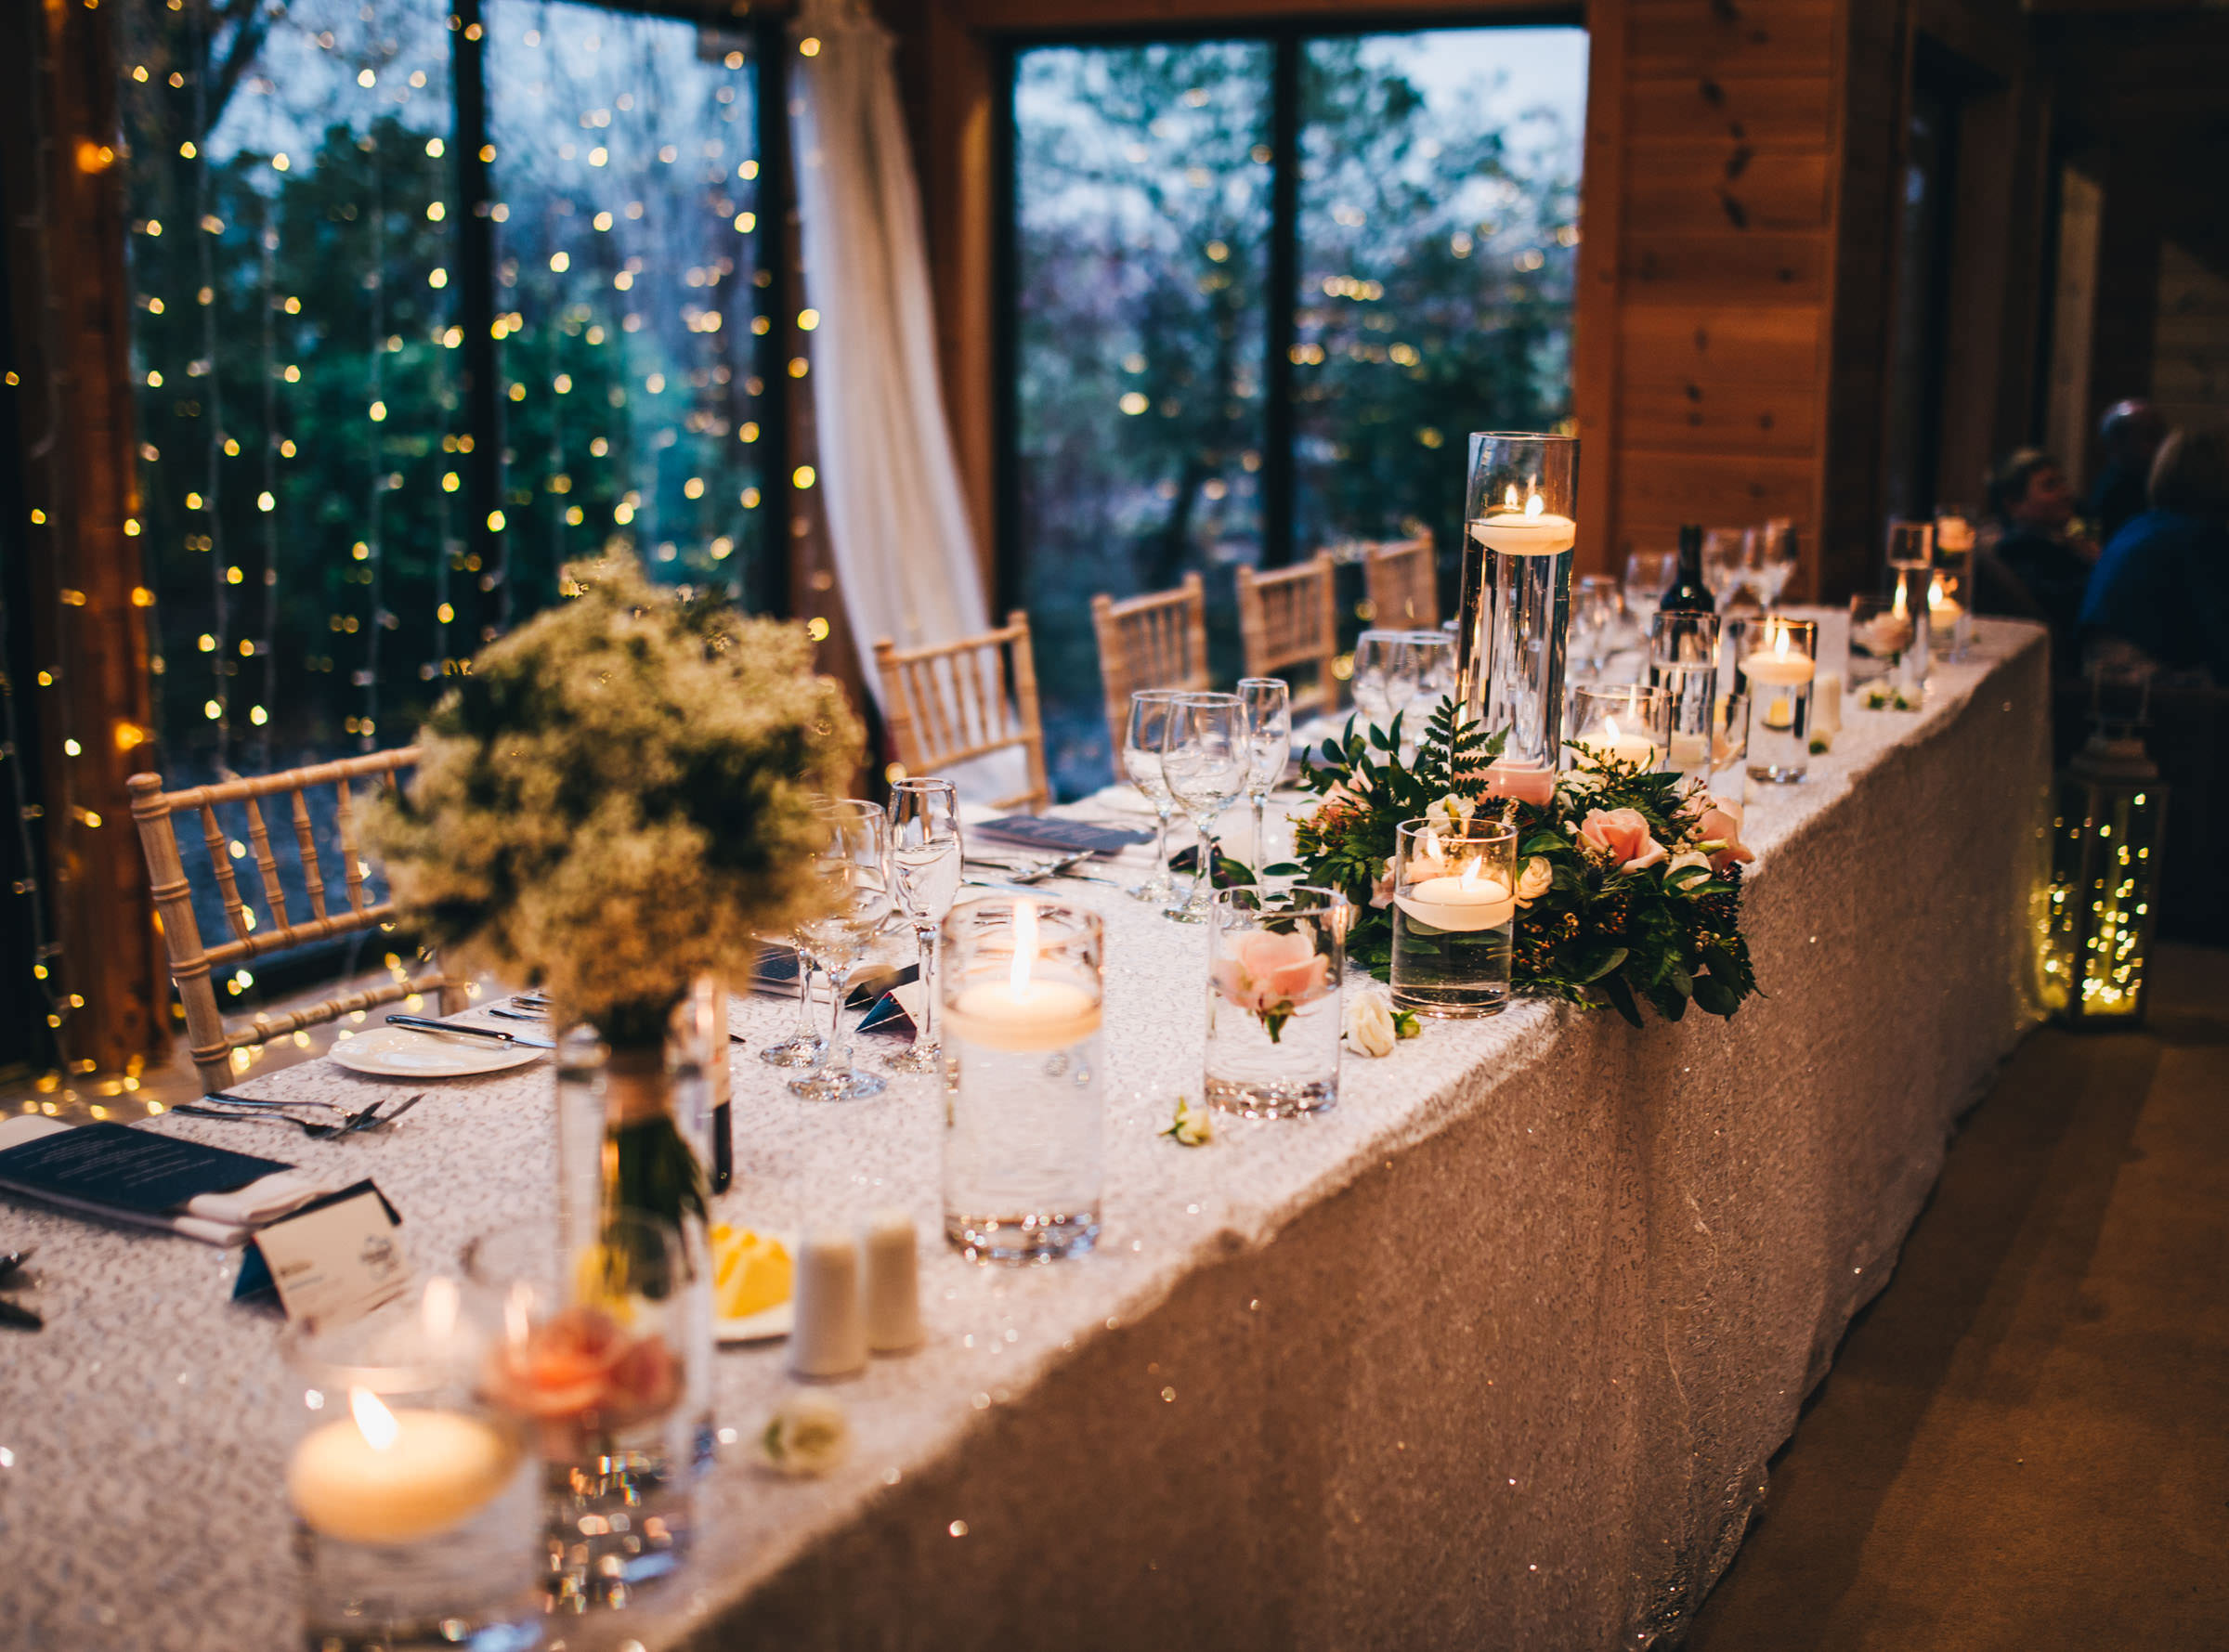 sparkly winter decor - Styal Lodge wedding